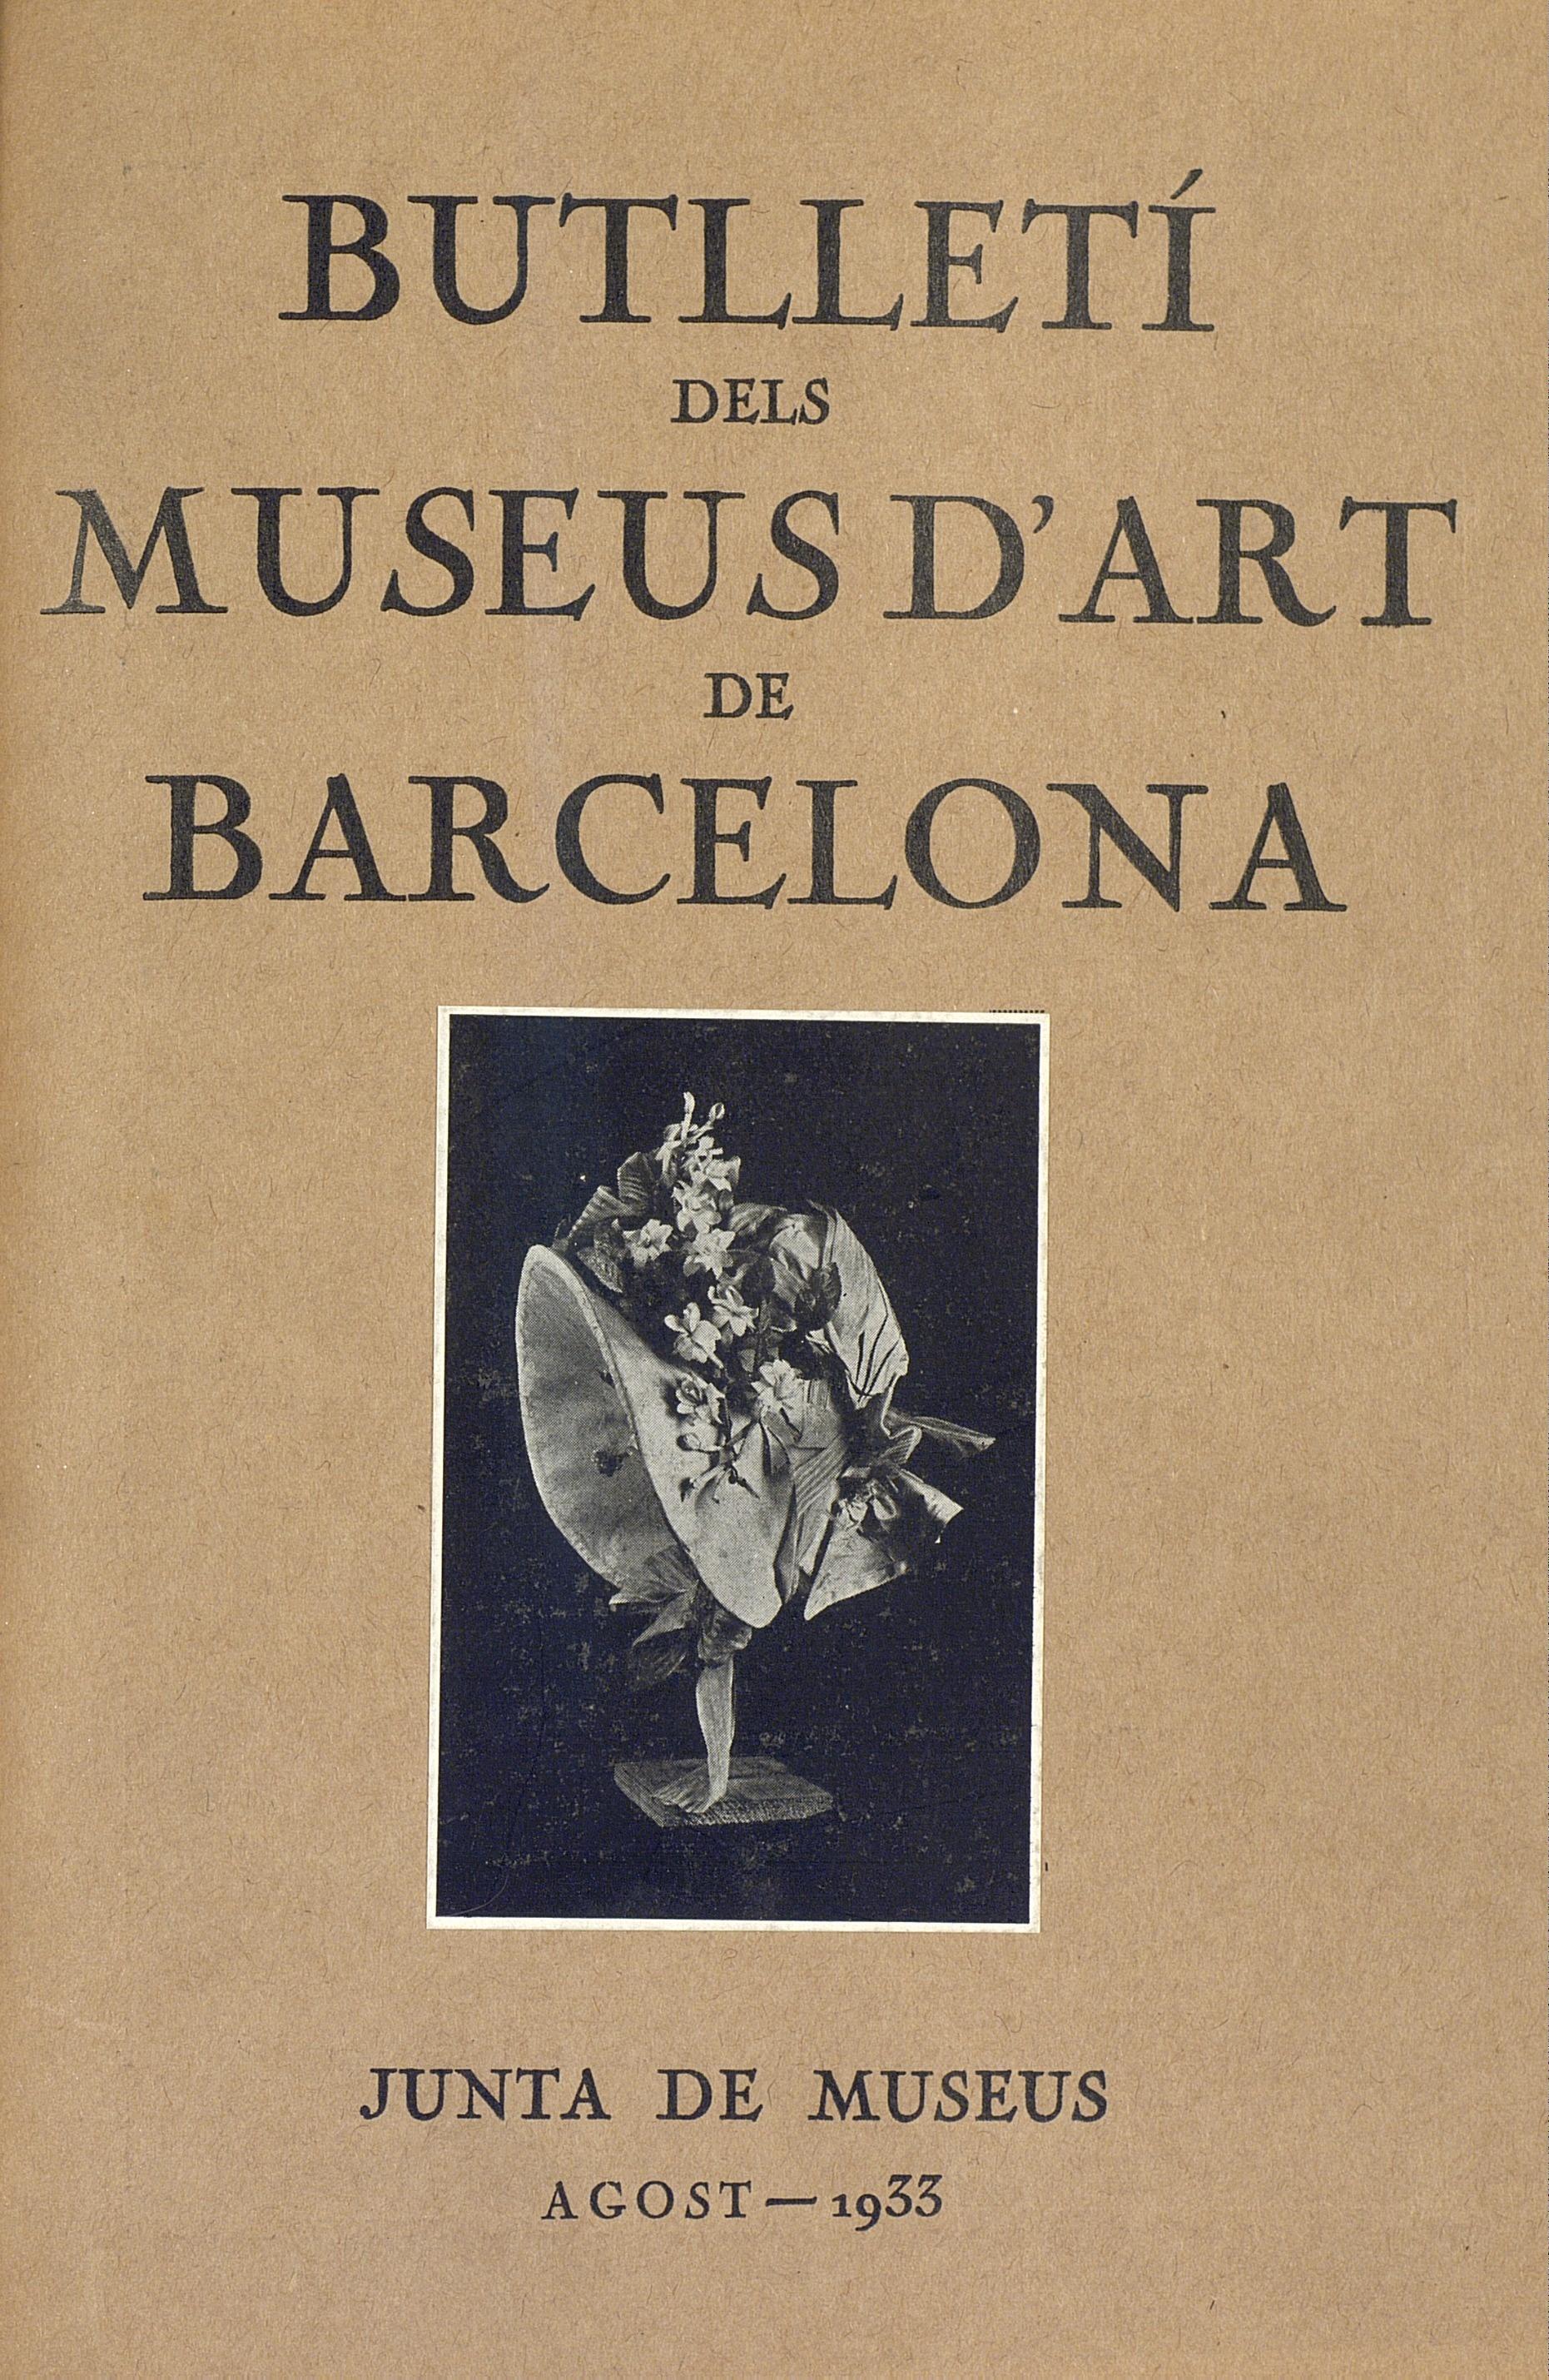 Vol. 3, núm. 27 (agost 1933)